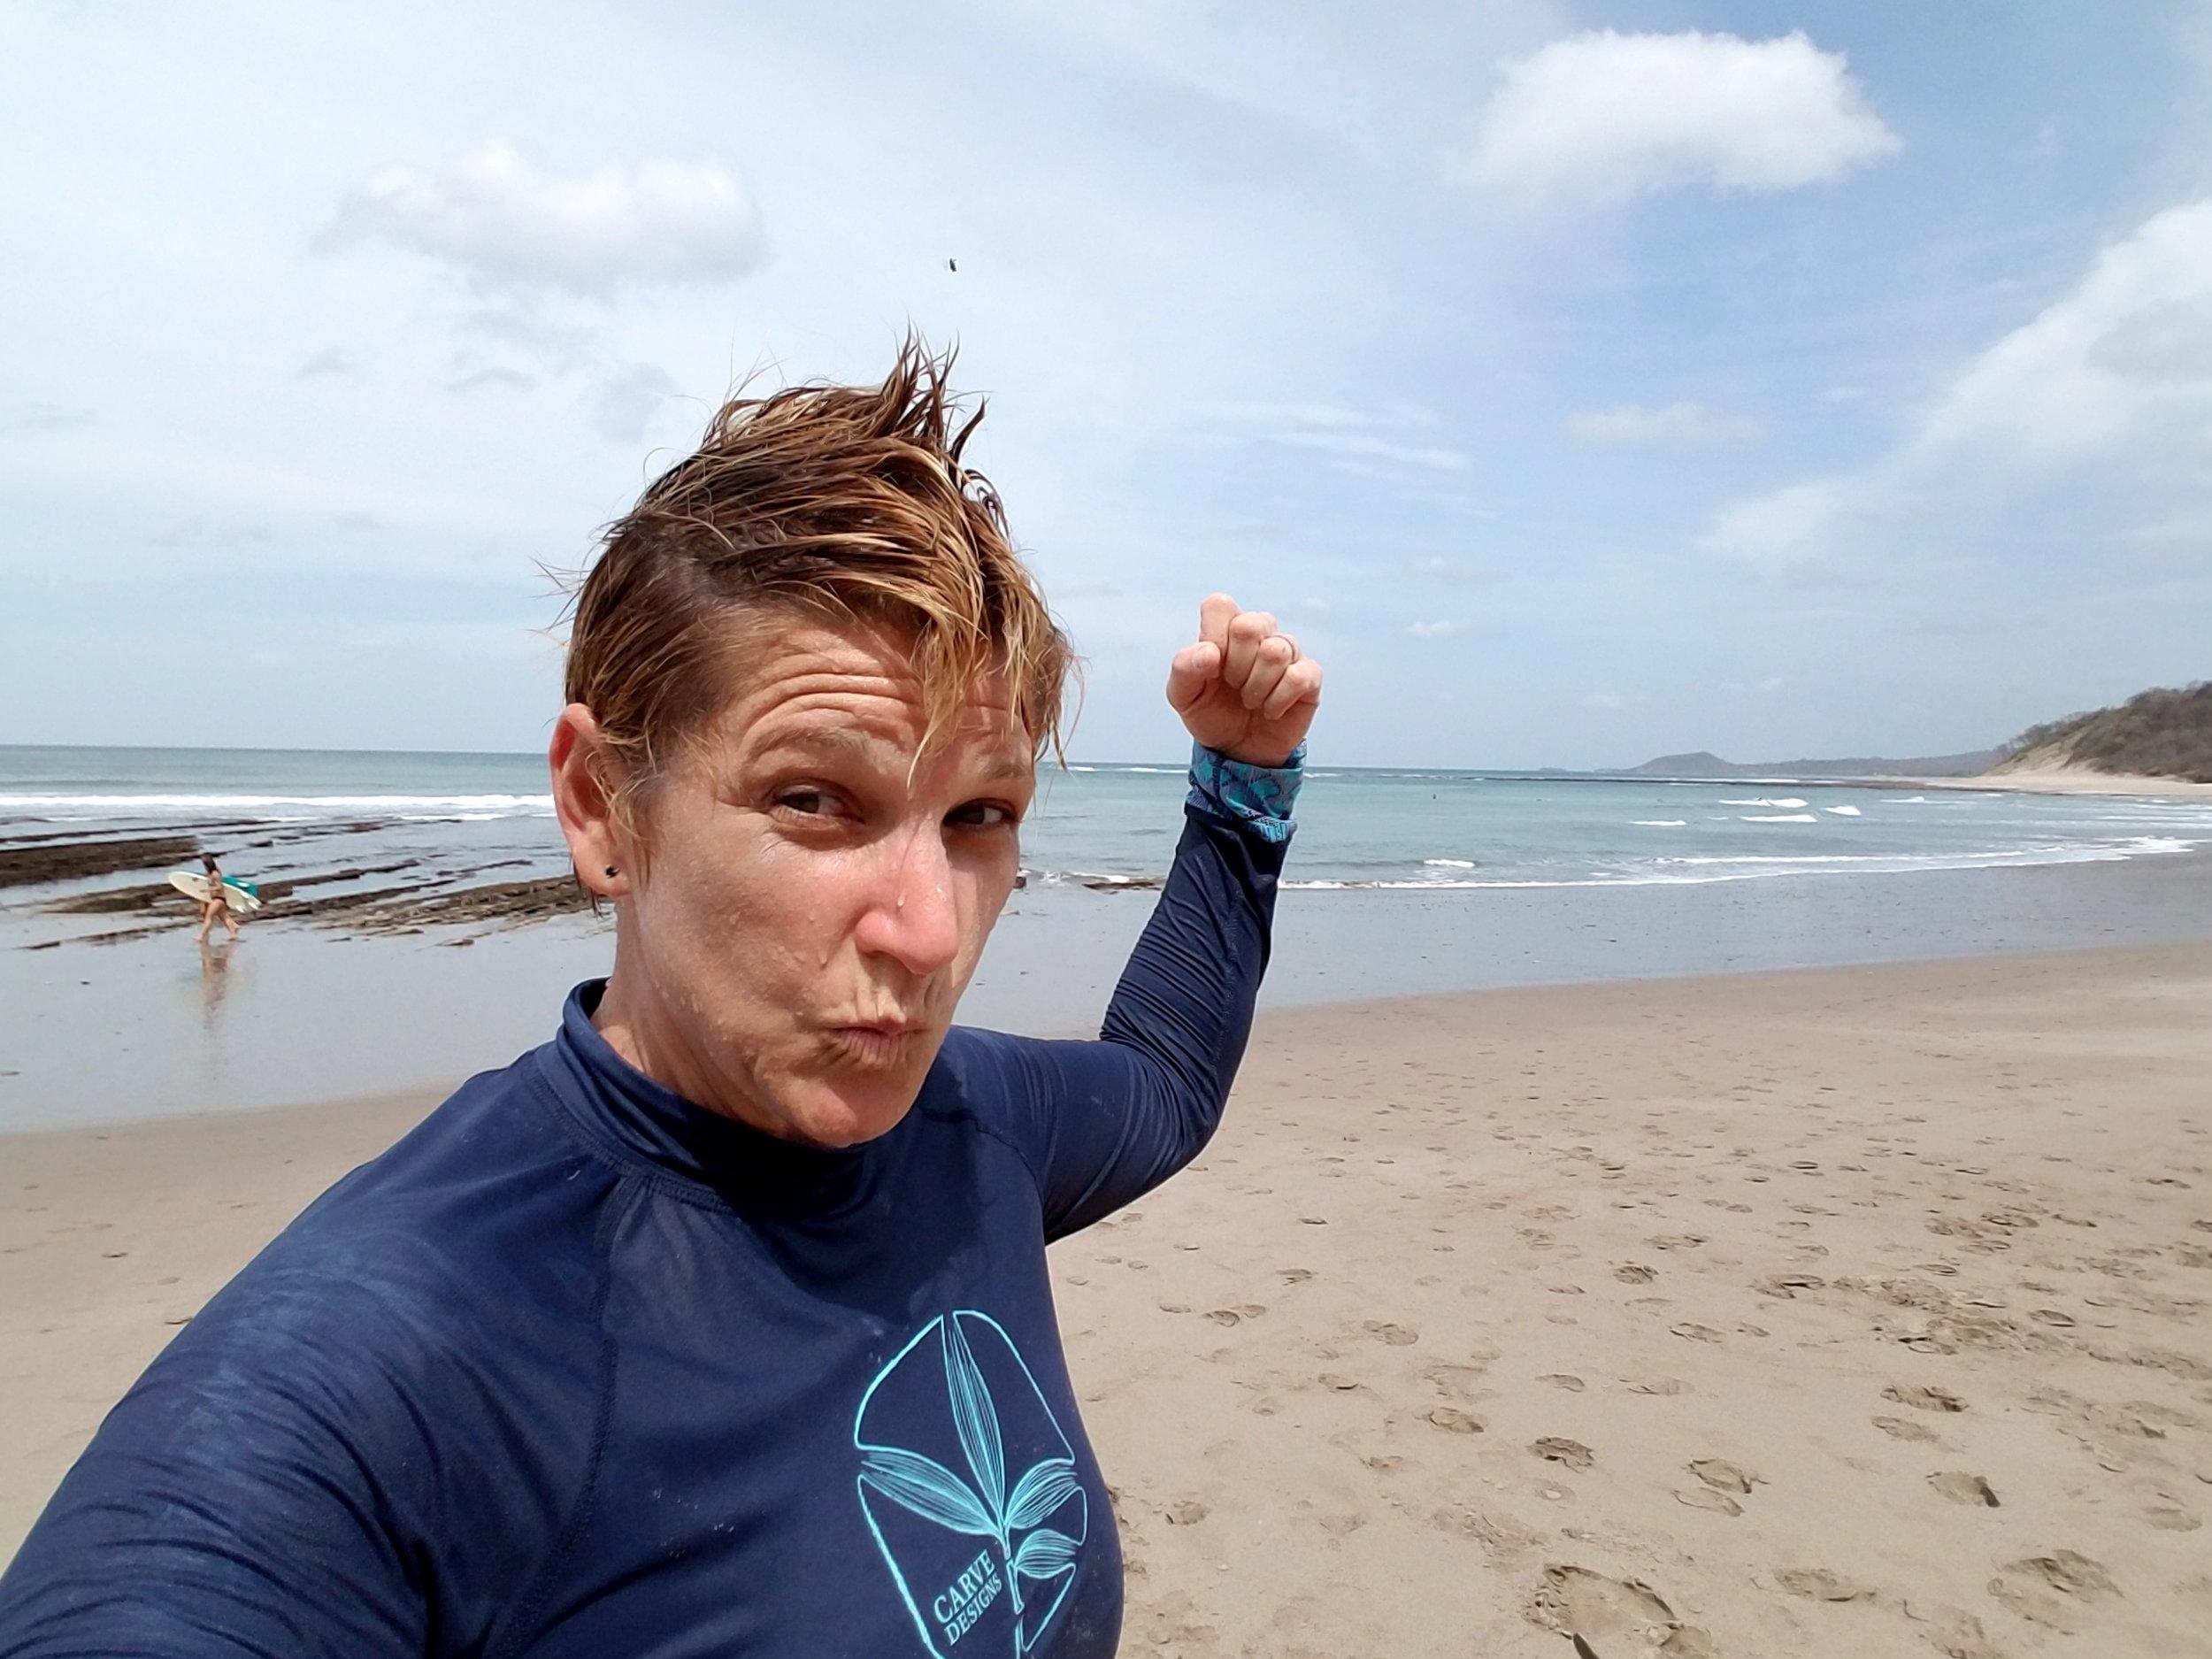 surf-with-a-mohawk-elena-sonnino.jpg